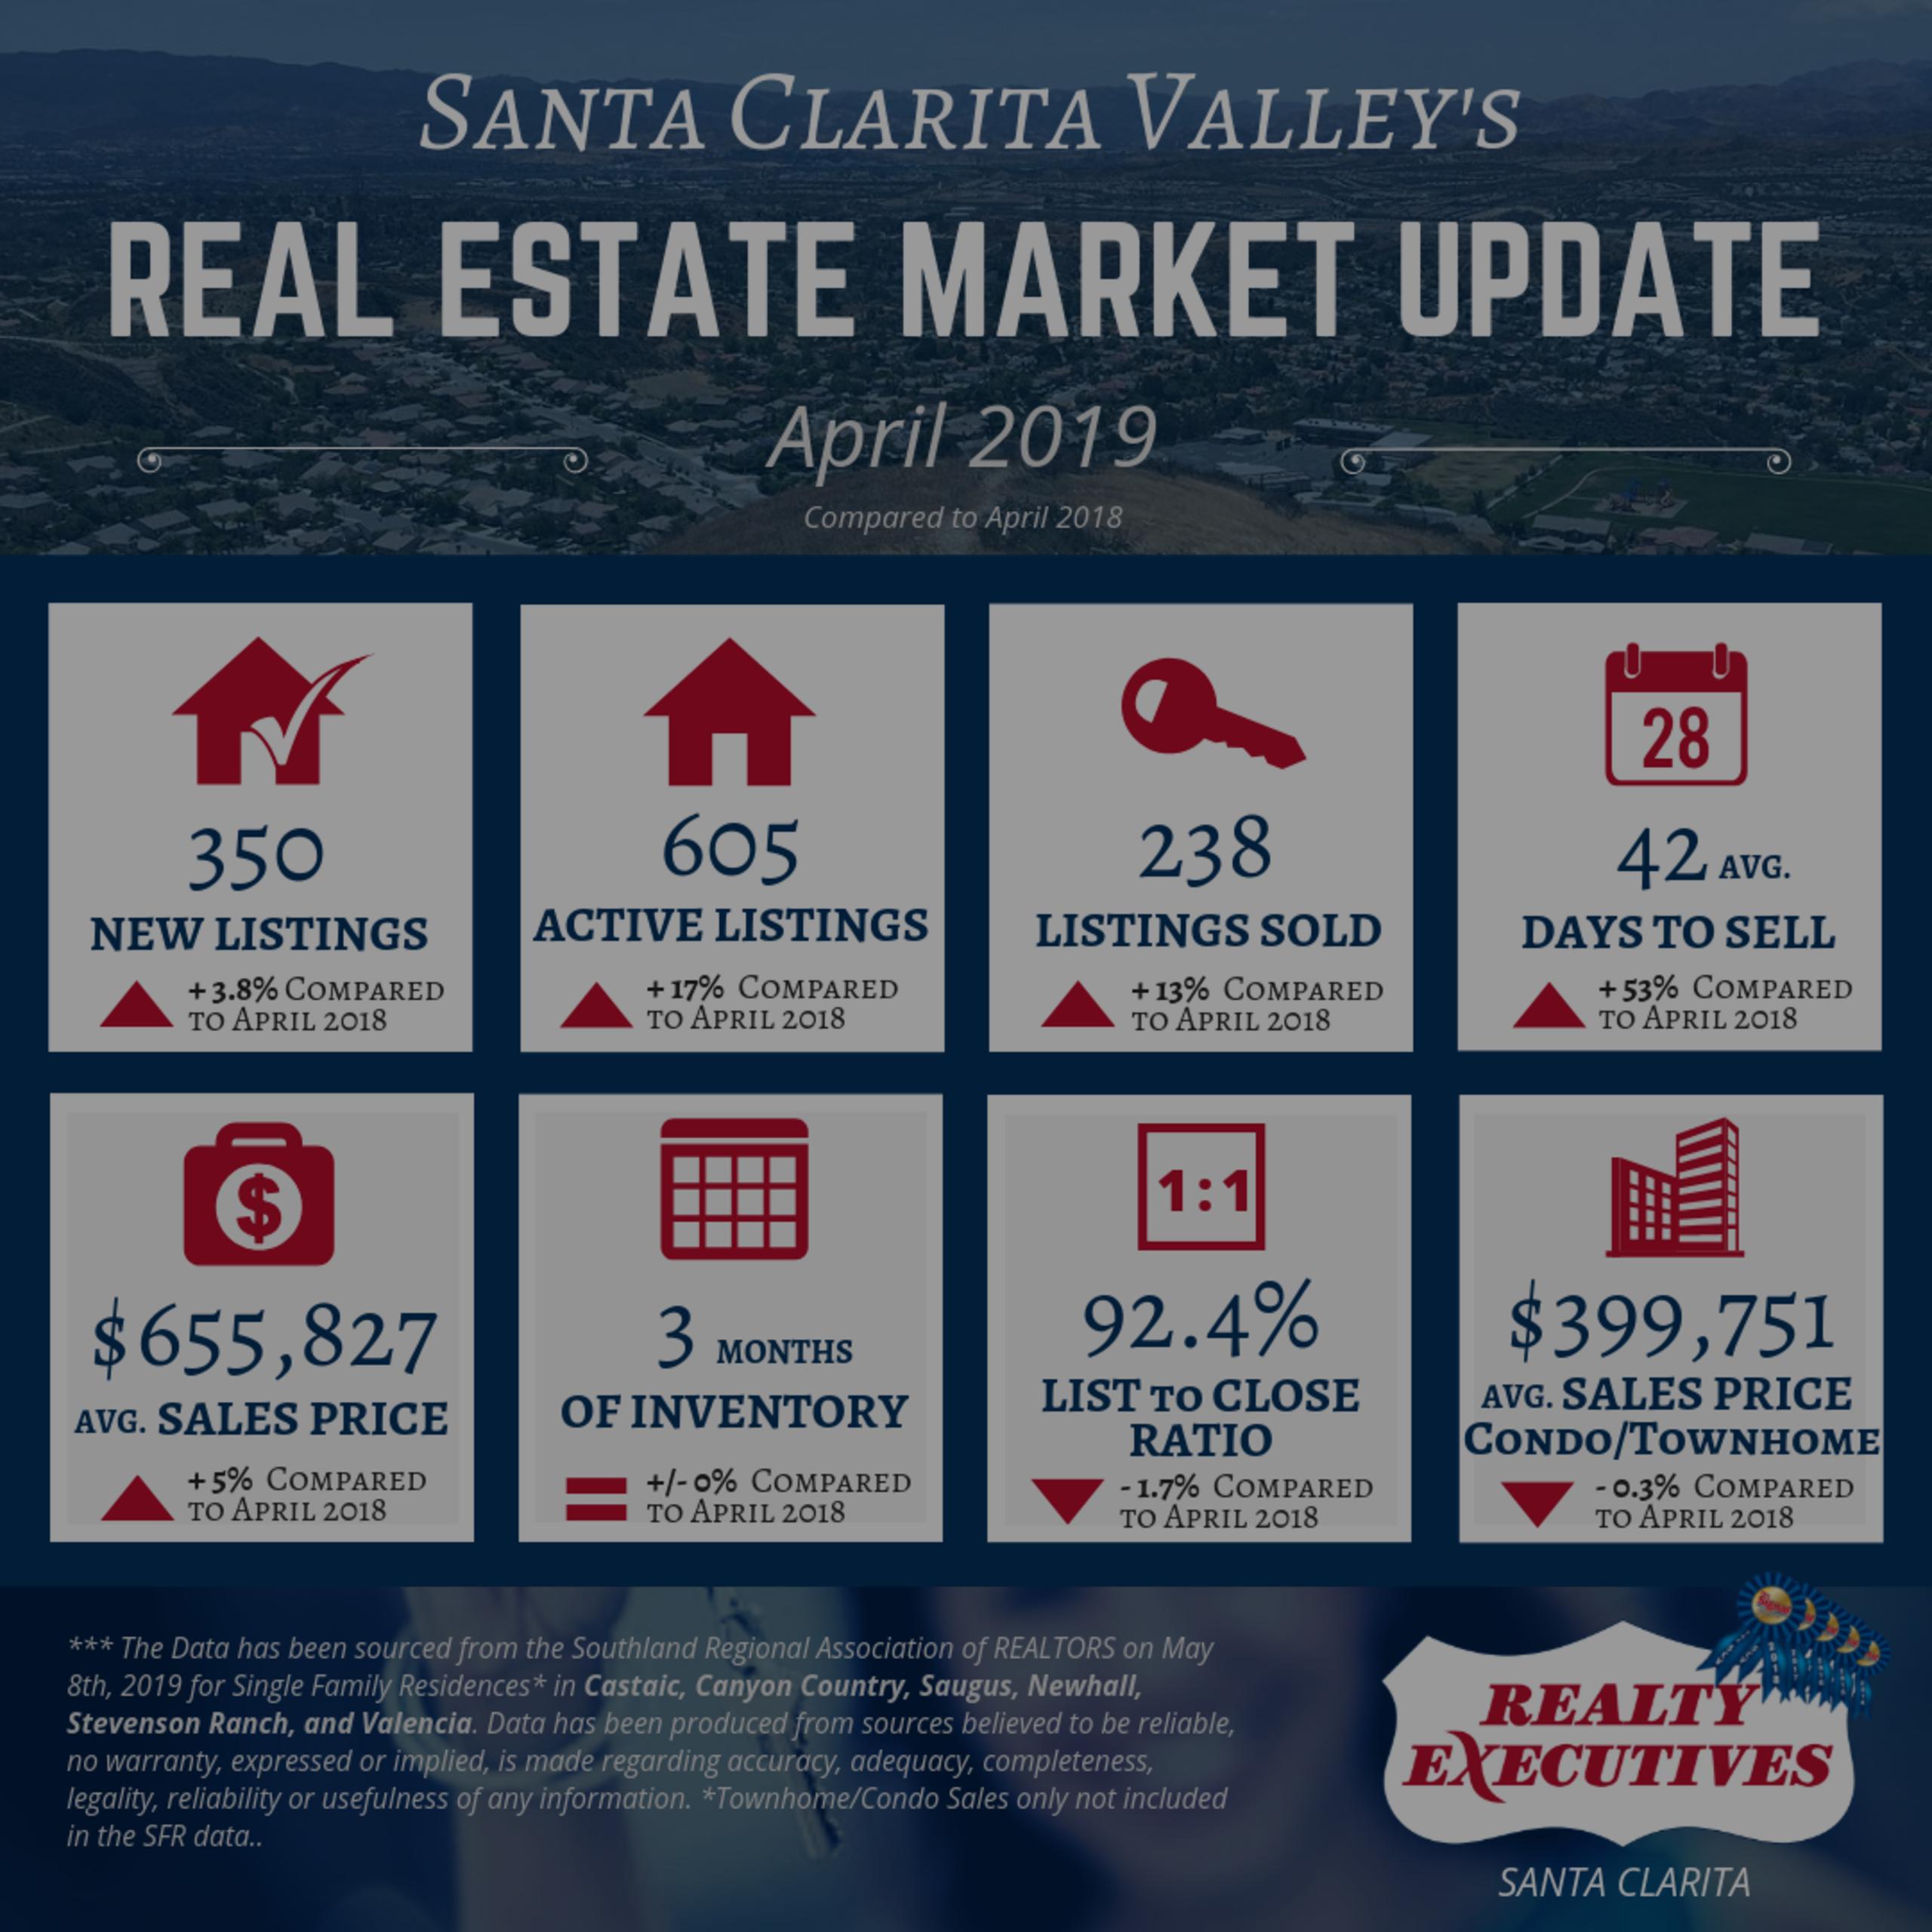 April 2019: Santa Clarita Valley Real Estate Market Update